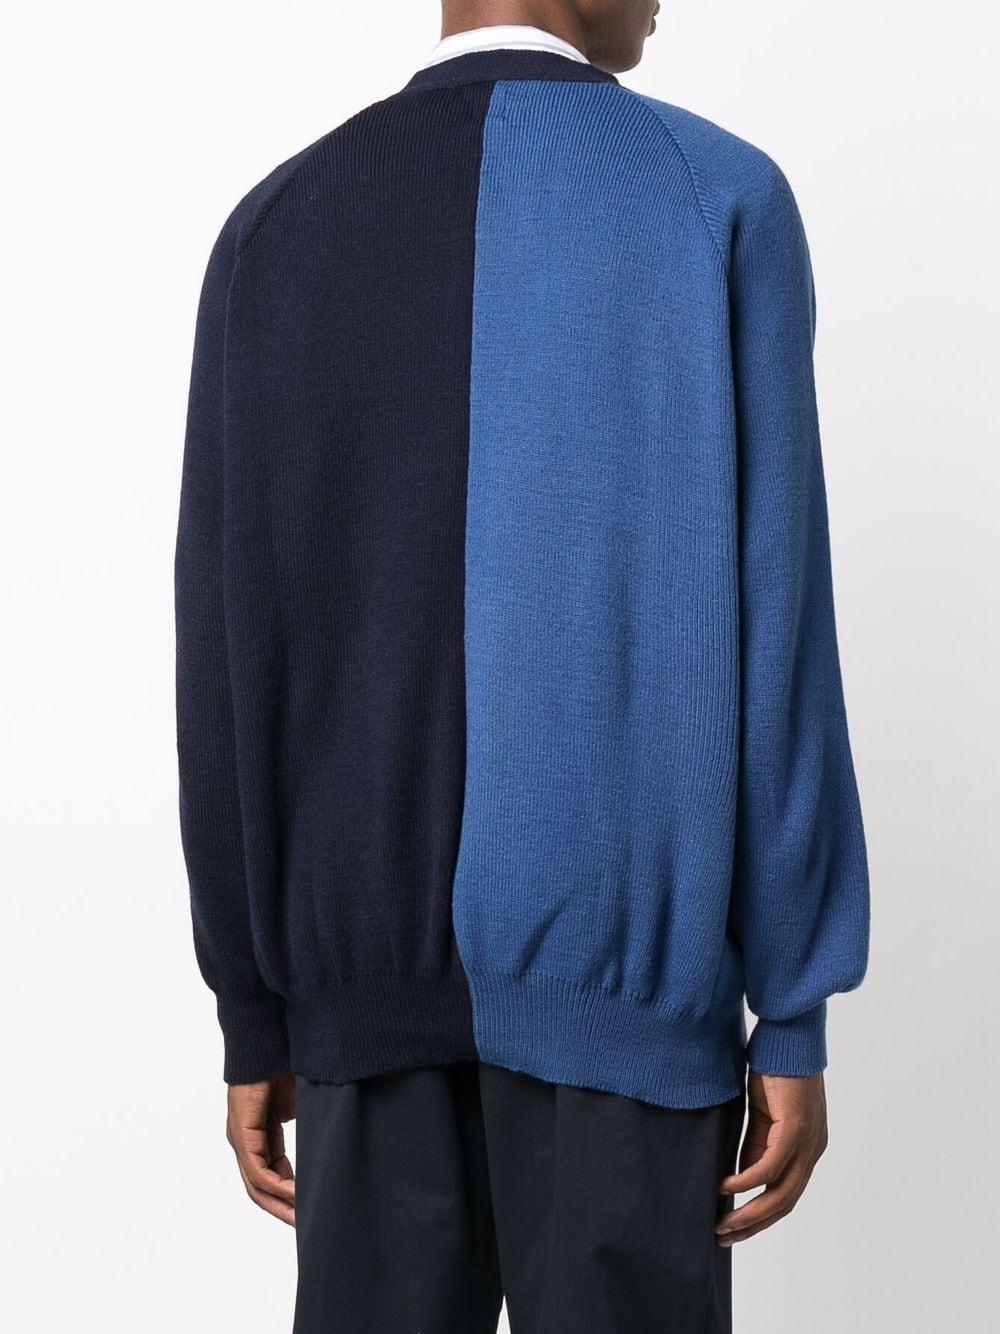 bicolor cardigan man blue navy in acrylic COMME DES GARÇONS SHIRT   Sweaters   FH-N501-W211